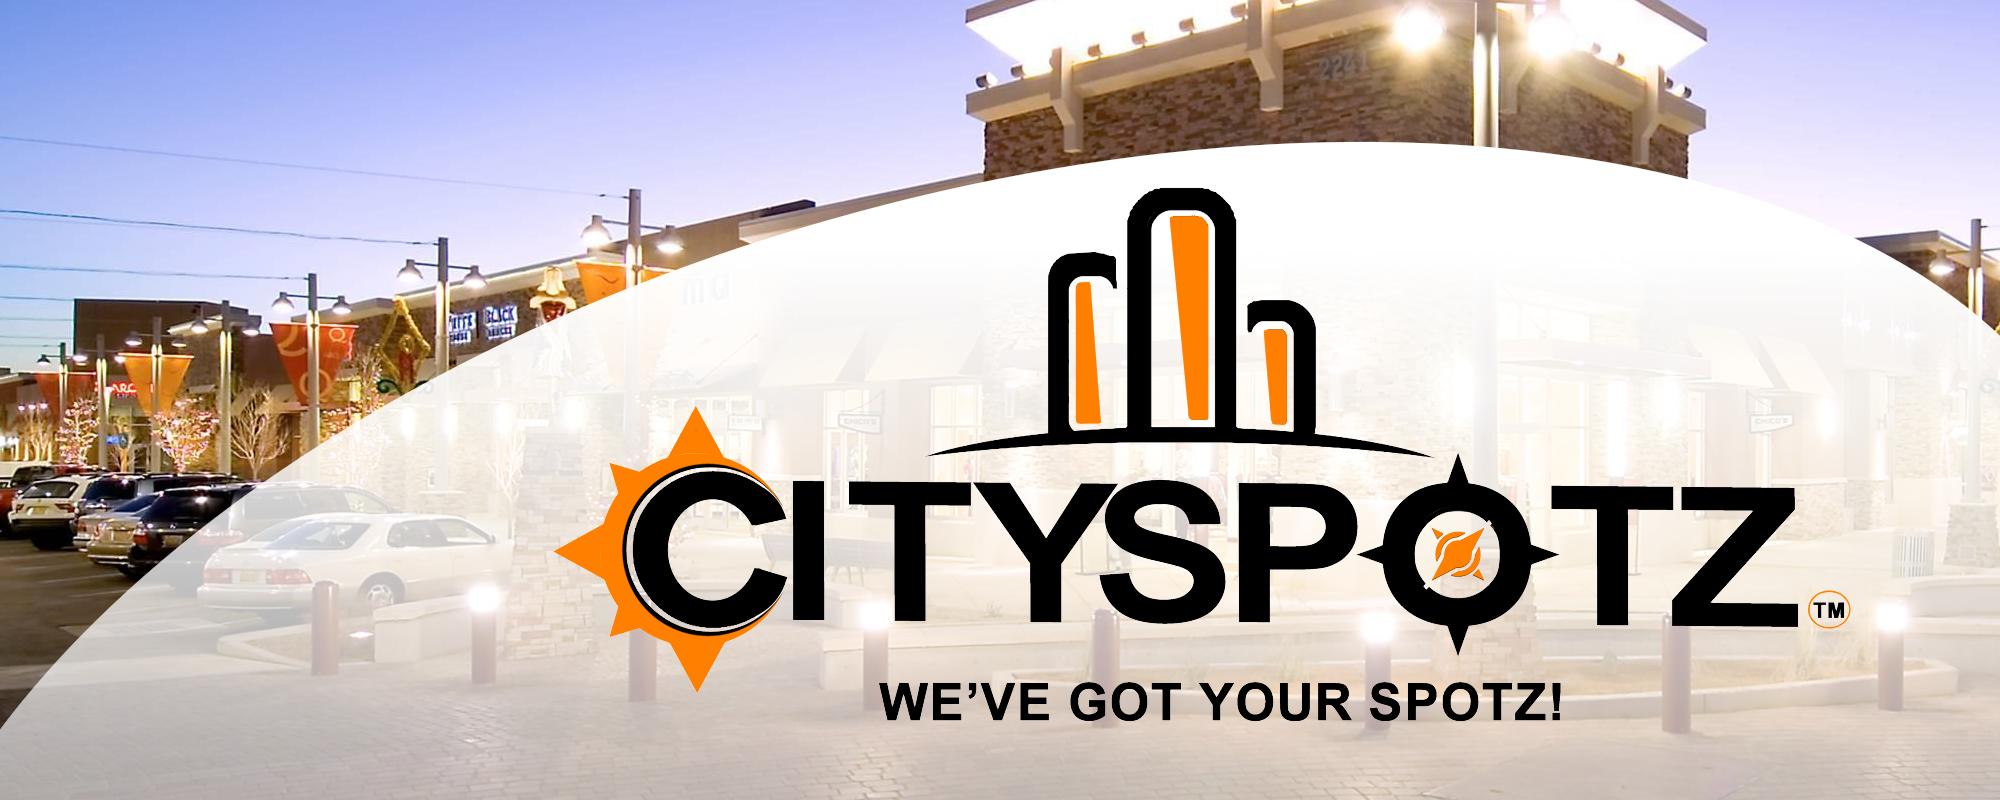 Cityspotz image 0